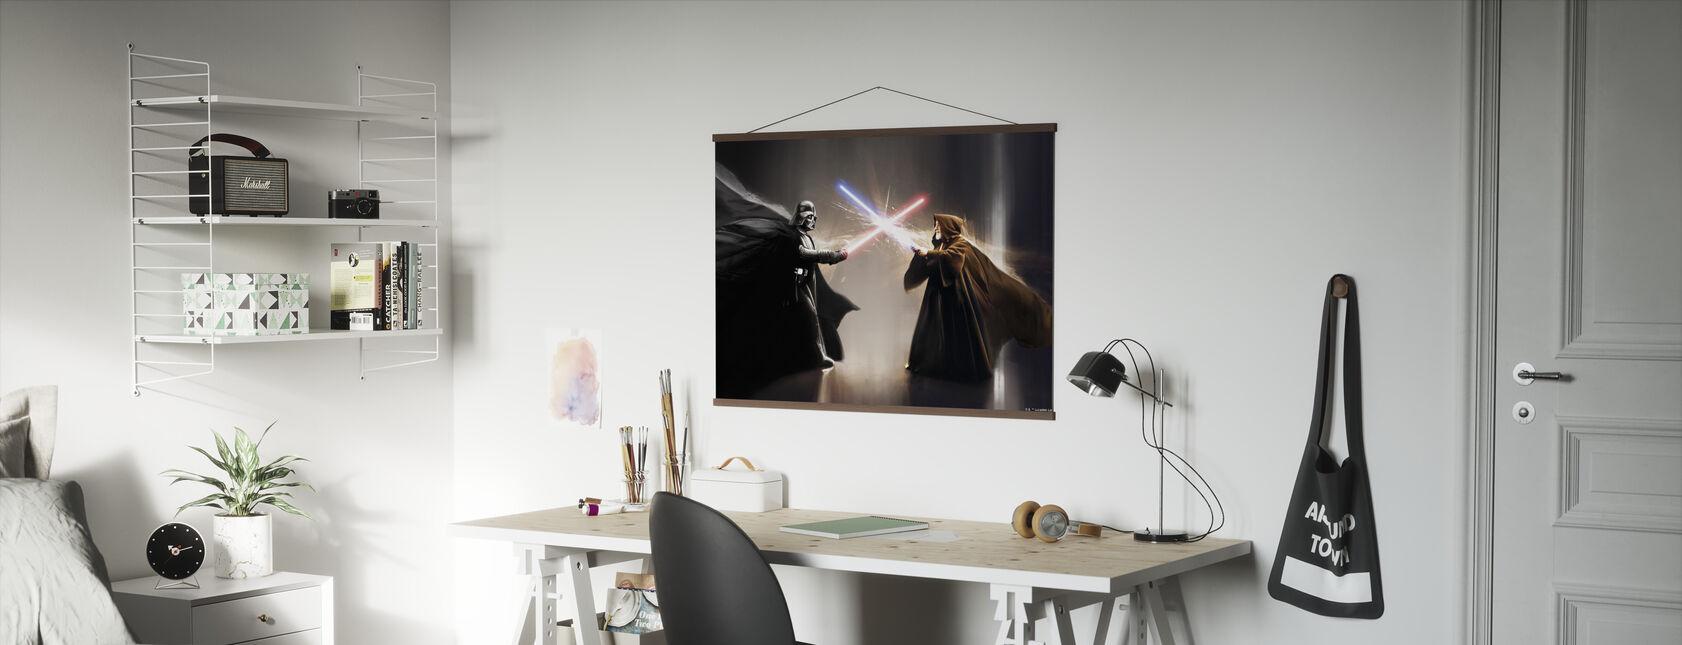 Star Wars - Darth Vader og Obi-Wan Kenobi - Plakat - Kontor